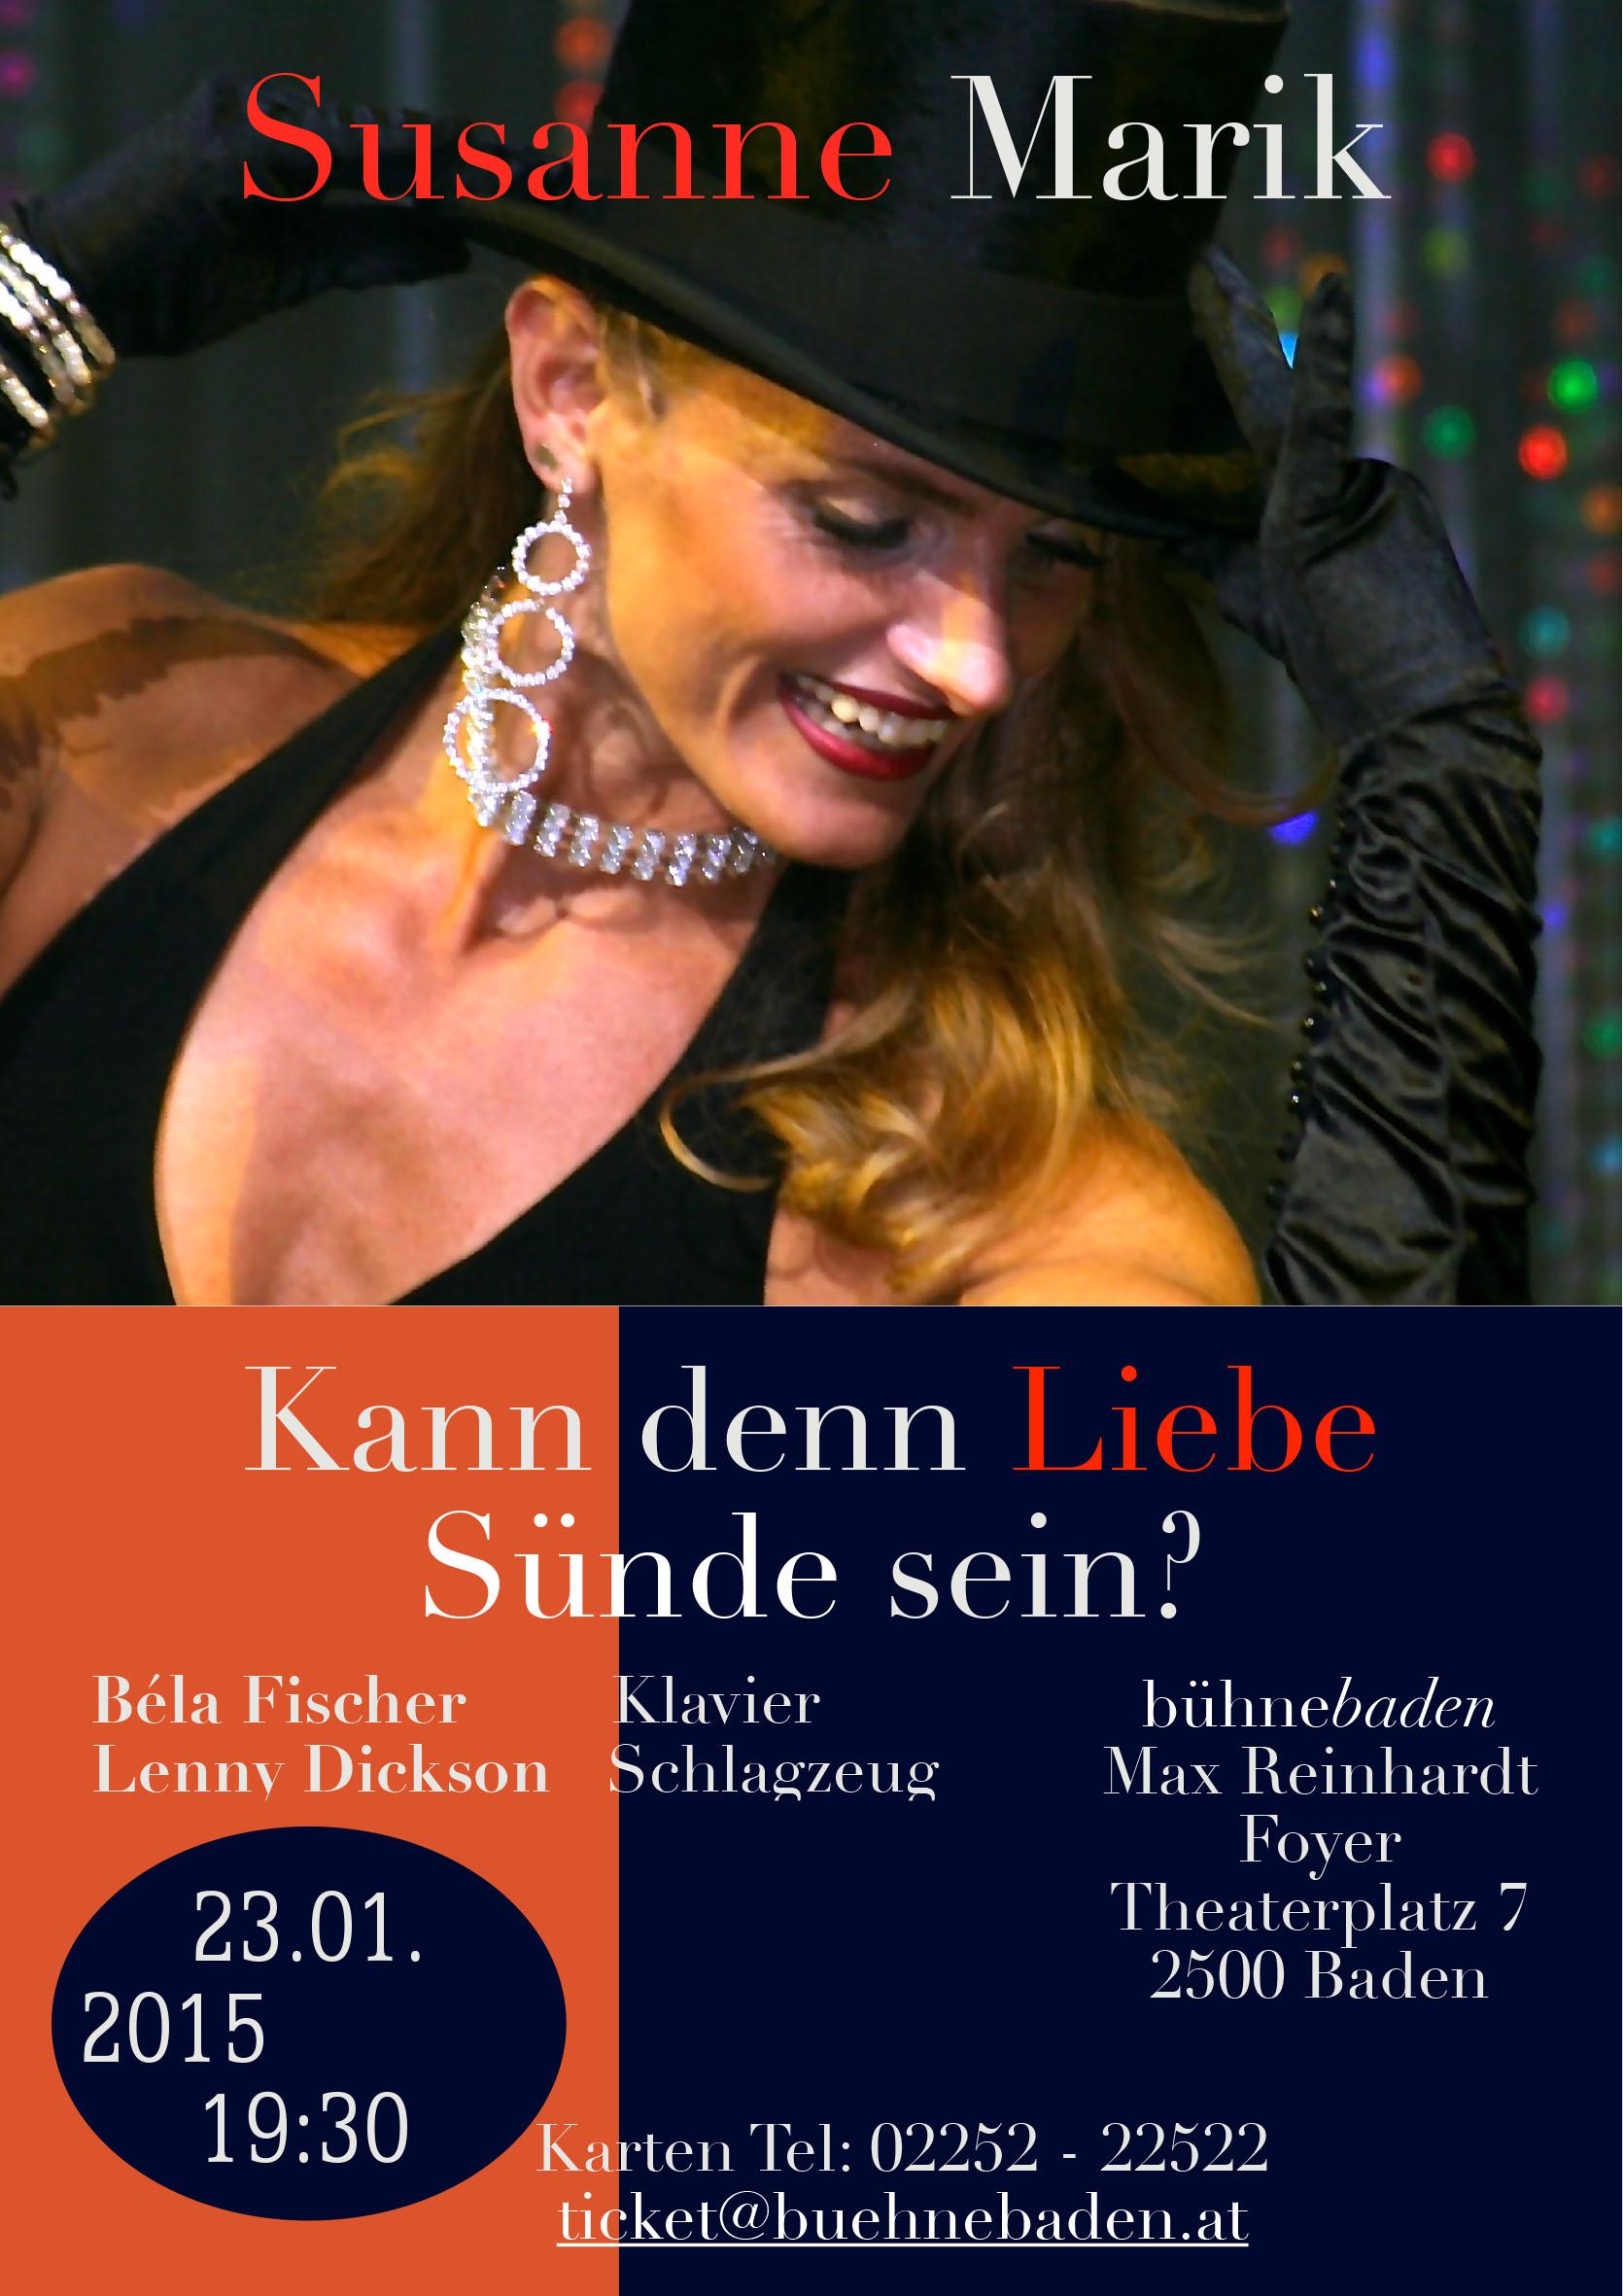 Bühne Baden Plakat